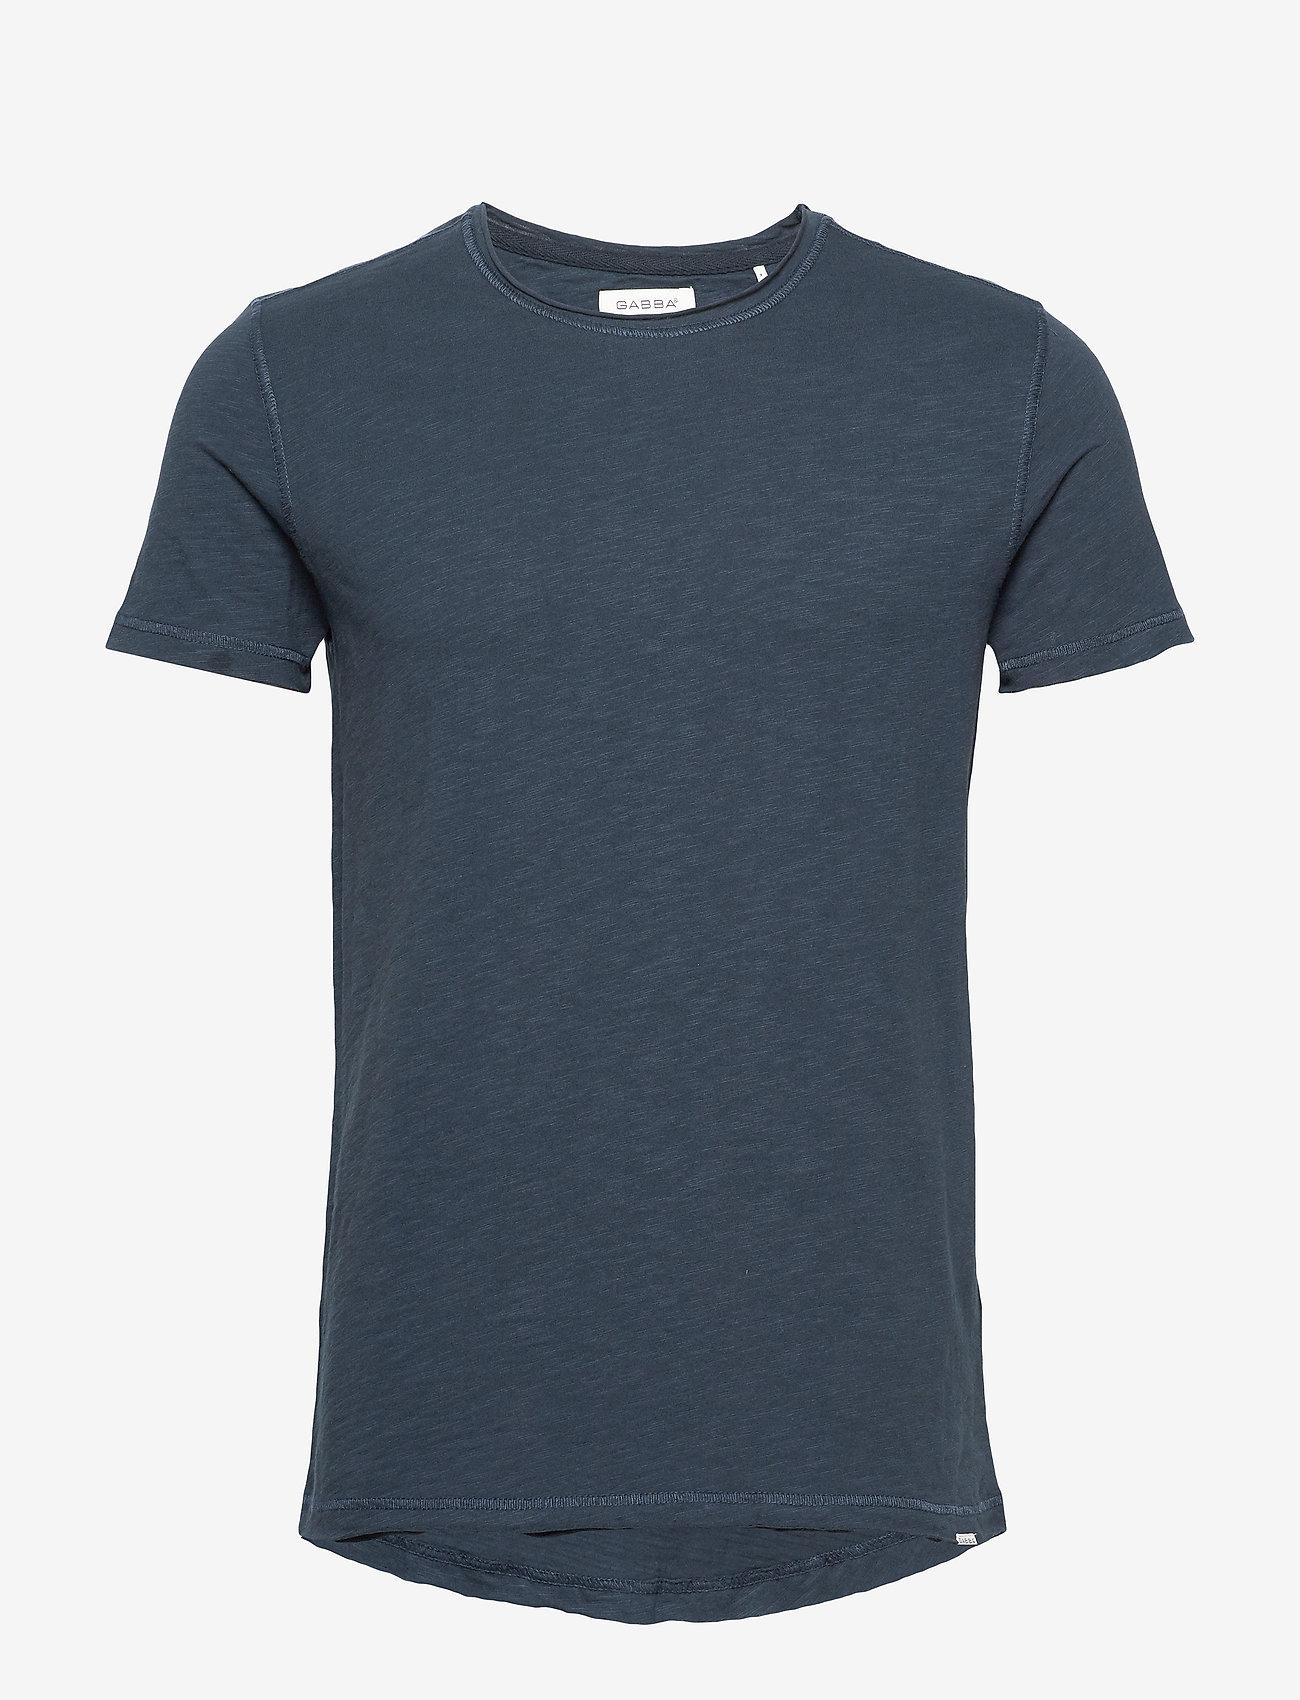 Gabba - Konrad Slub S/S Tee - basic t-shirts - navy - 0